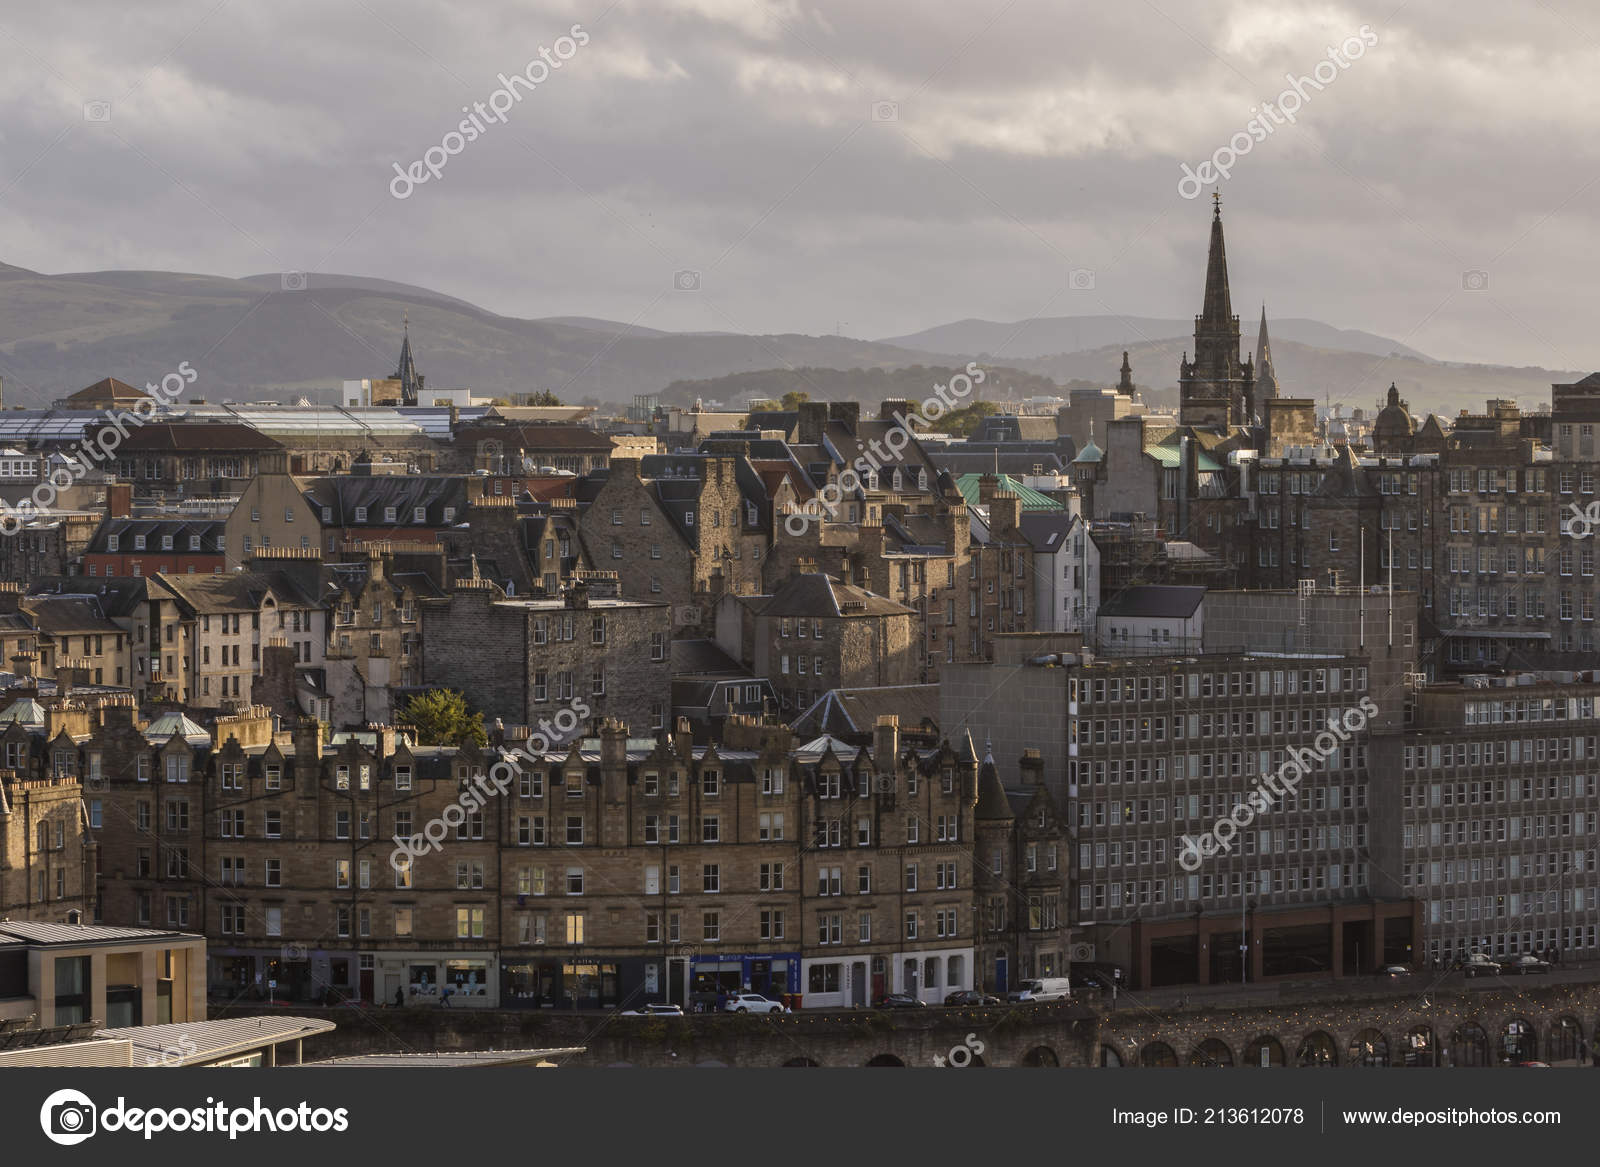 bbe44b4abb45 Tron Kirk Pentland Hills Edinburgh Skyline Scotland — Stock Photo ...